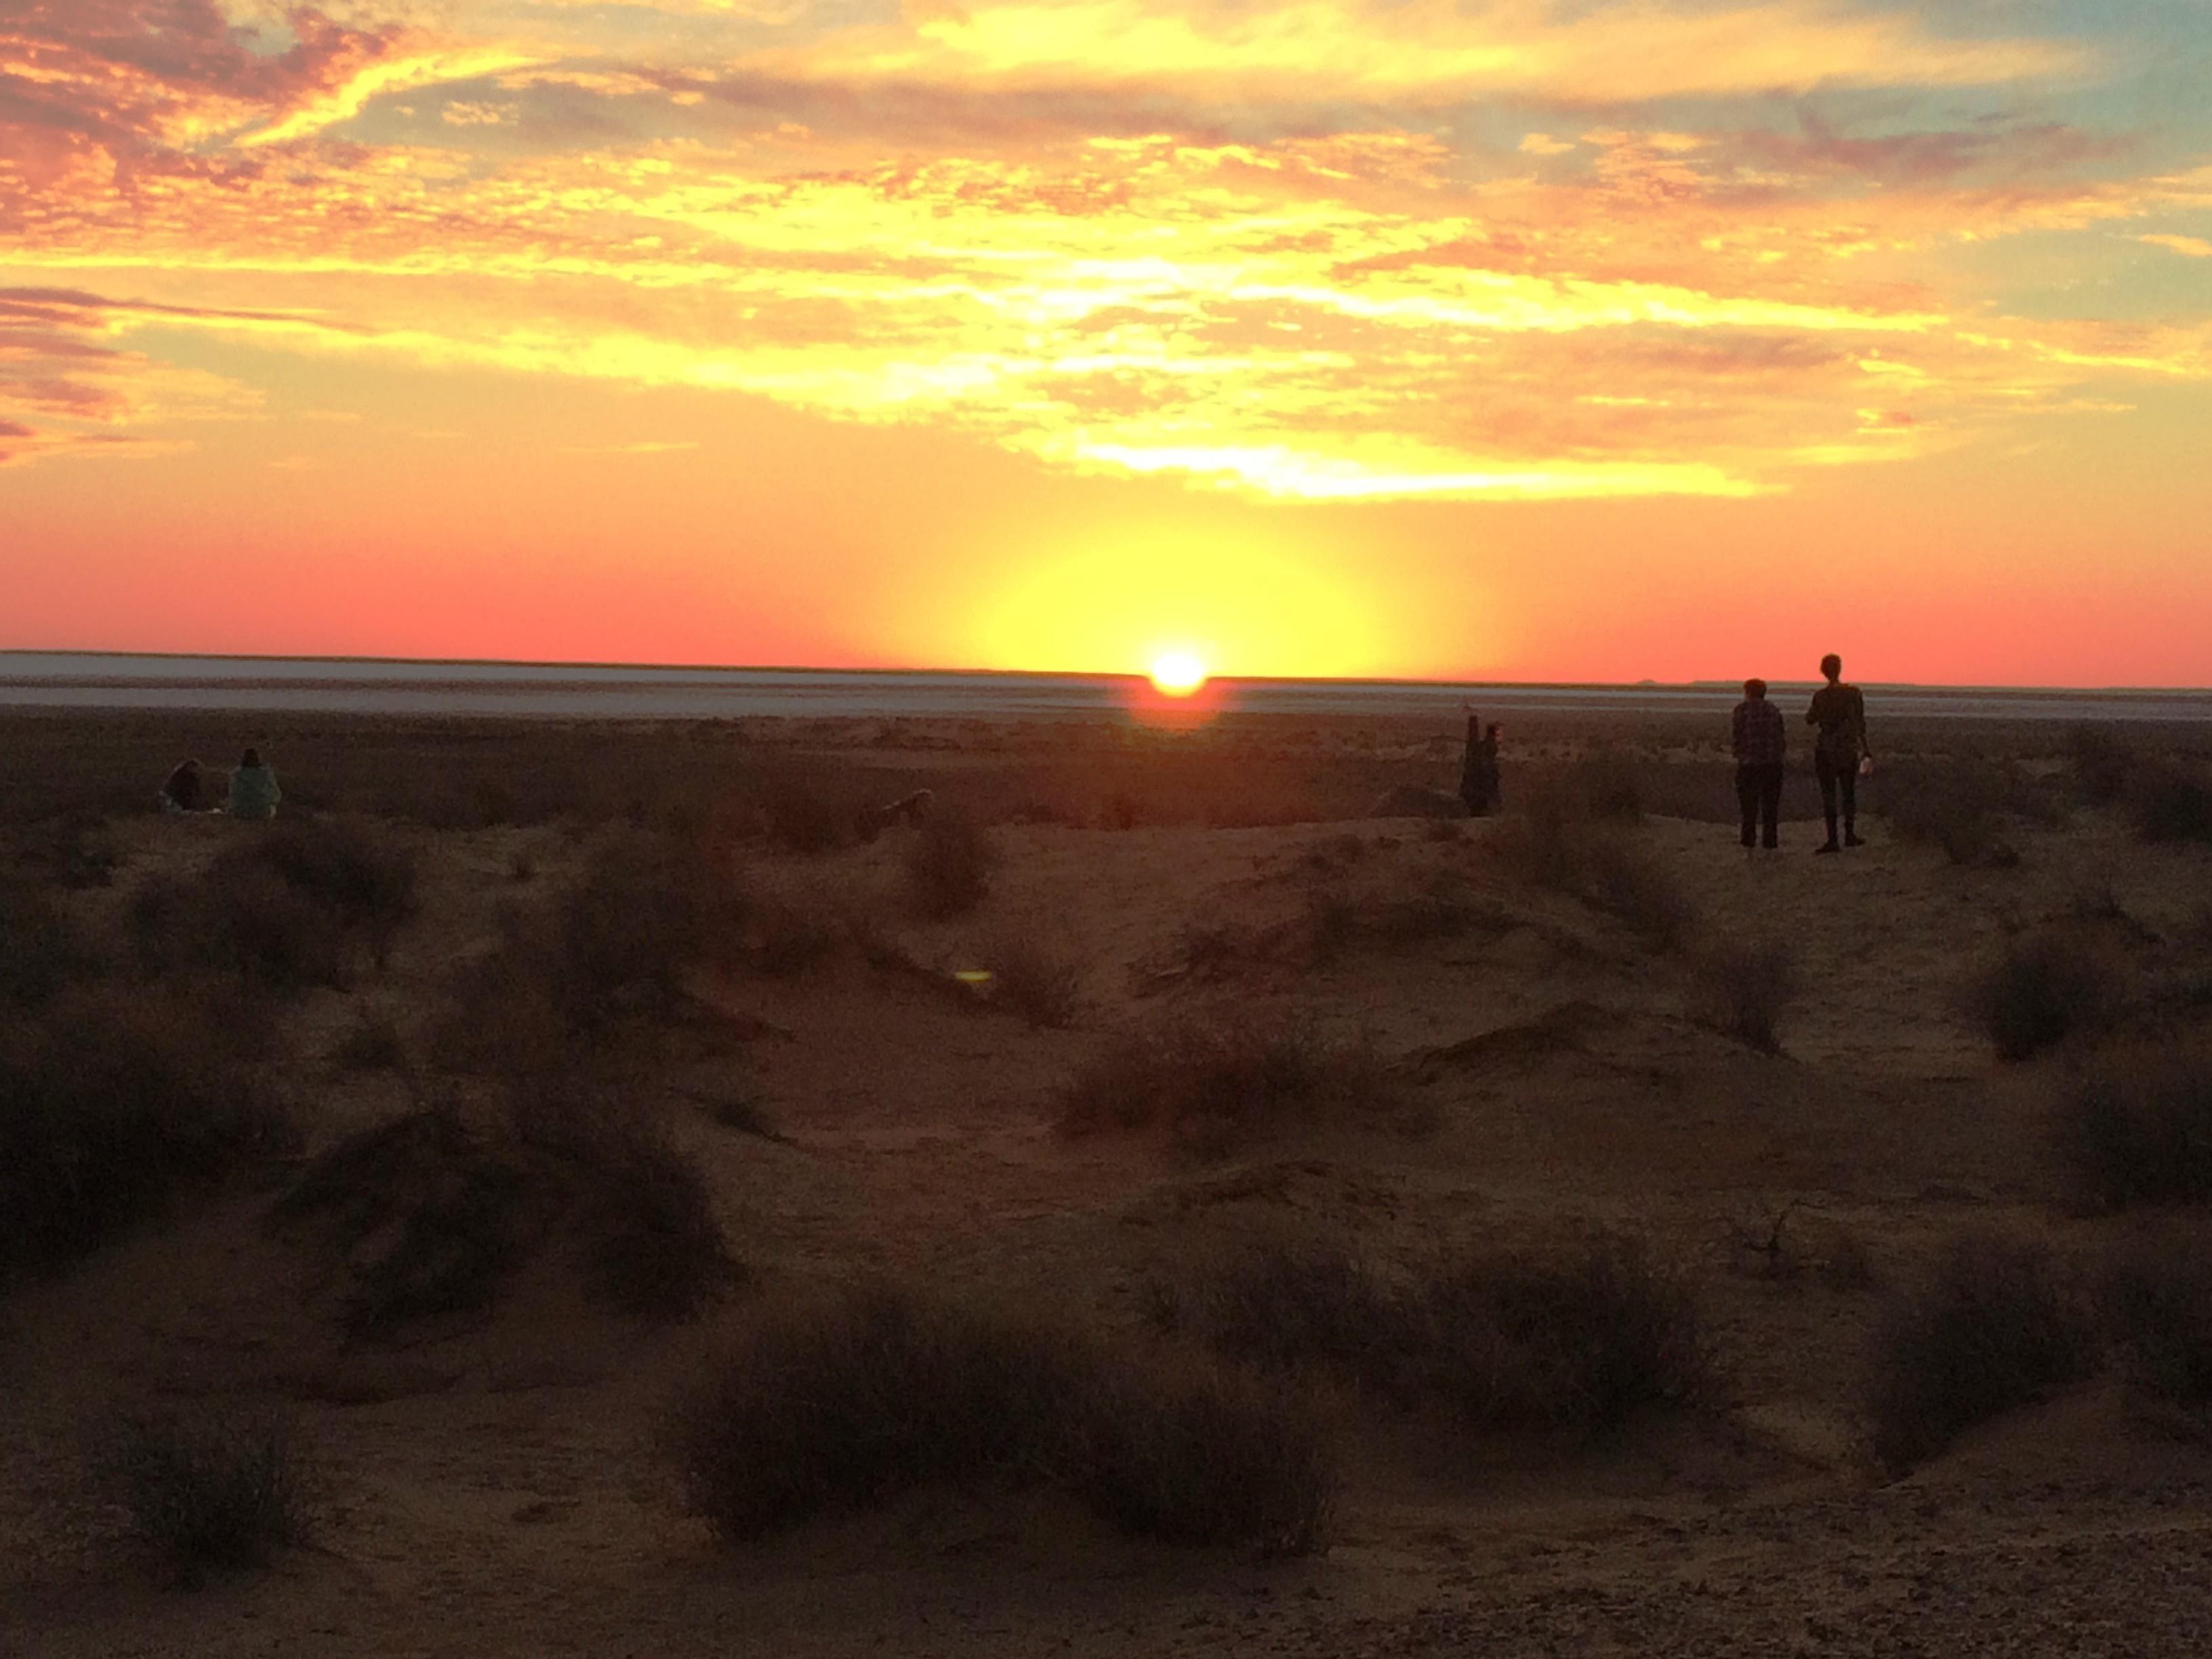 Sunset at Lake Eyre